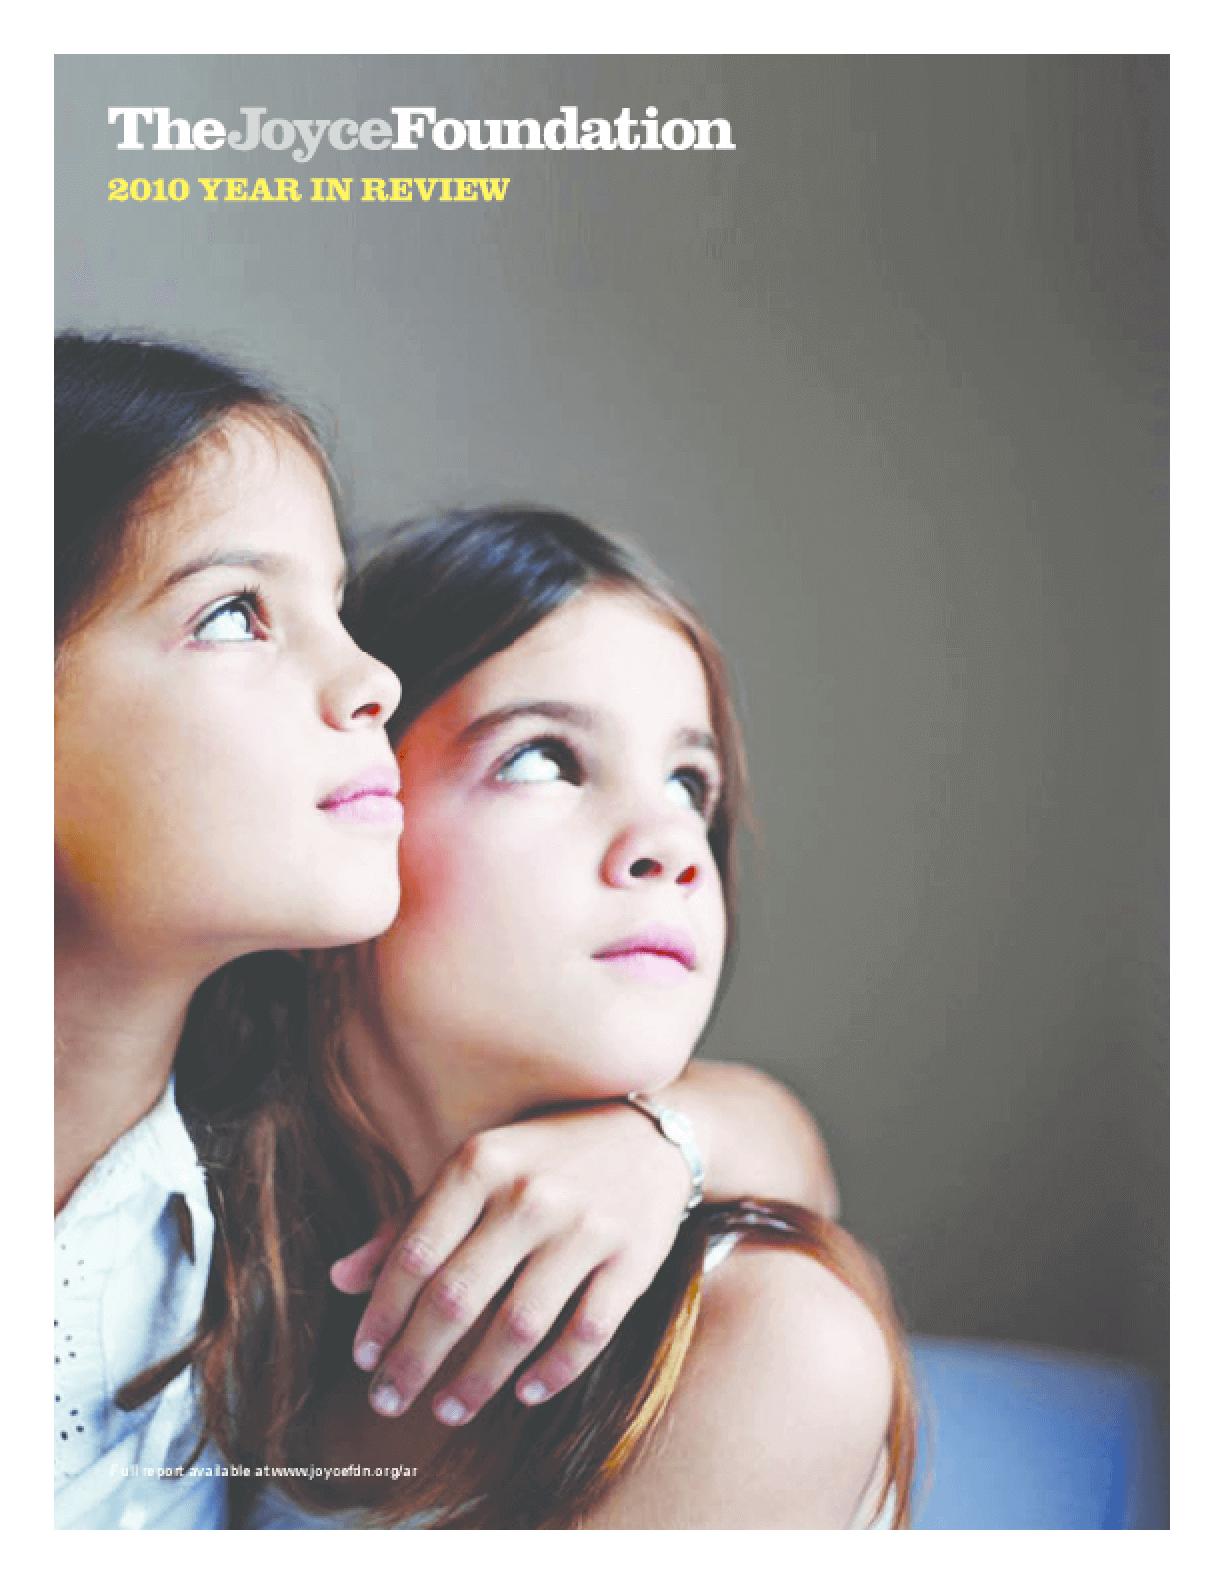 Joyce Foundation 2010 Annual Report